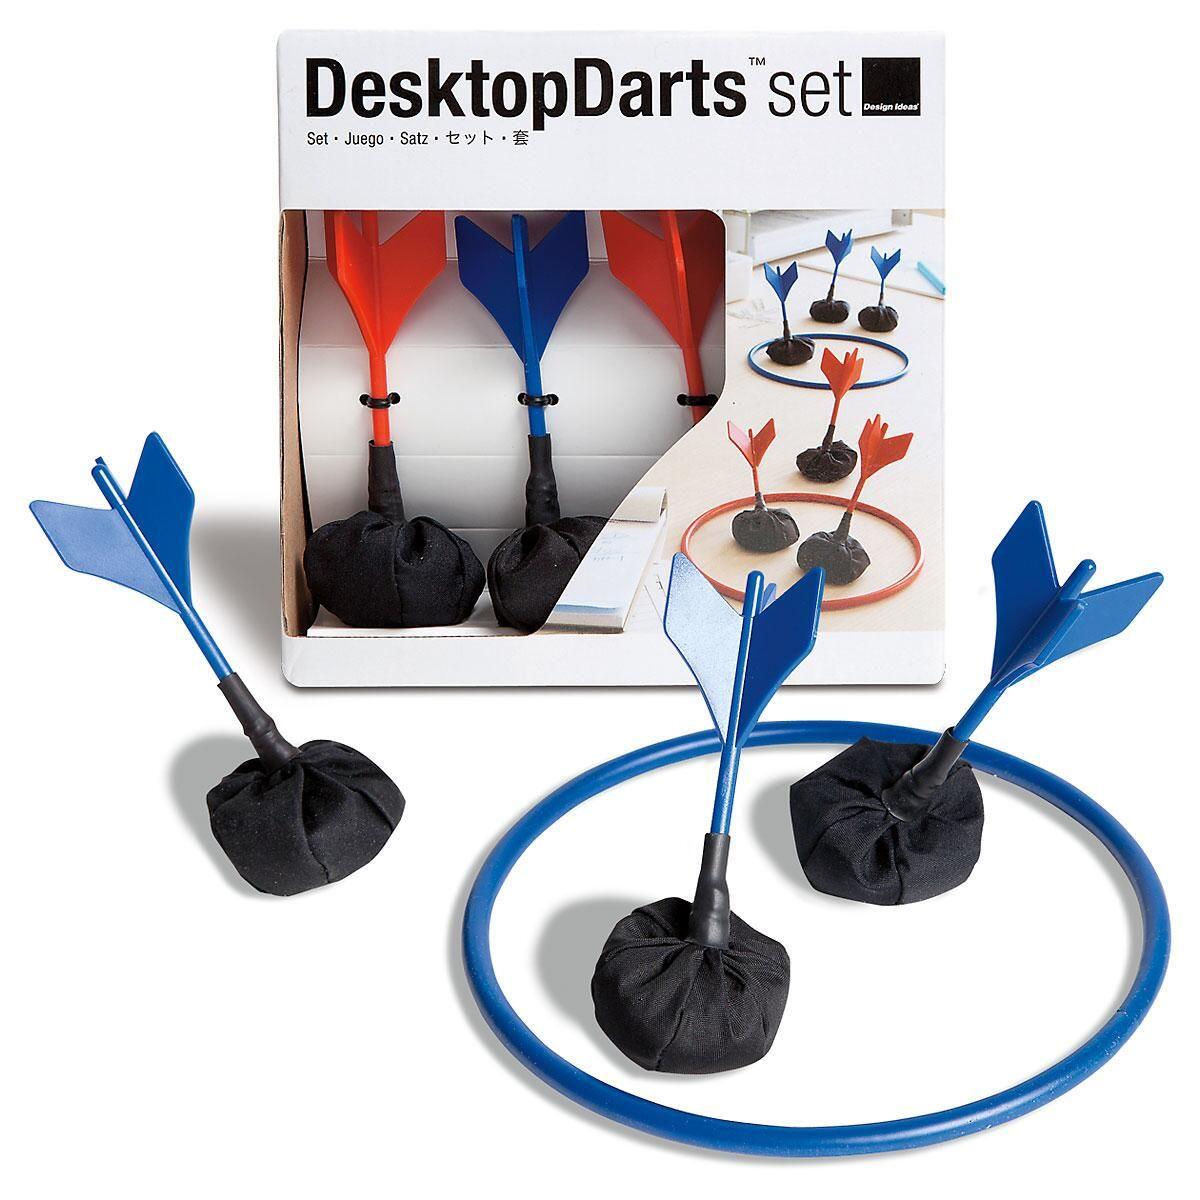 DeskTopDarts™